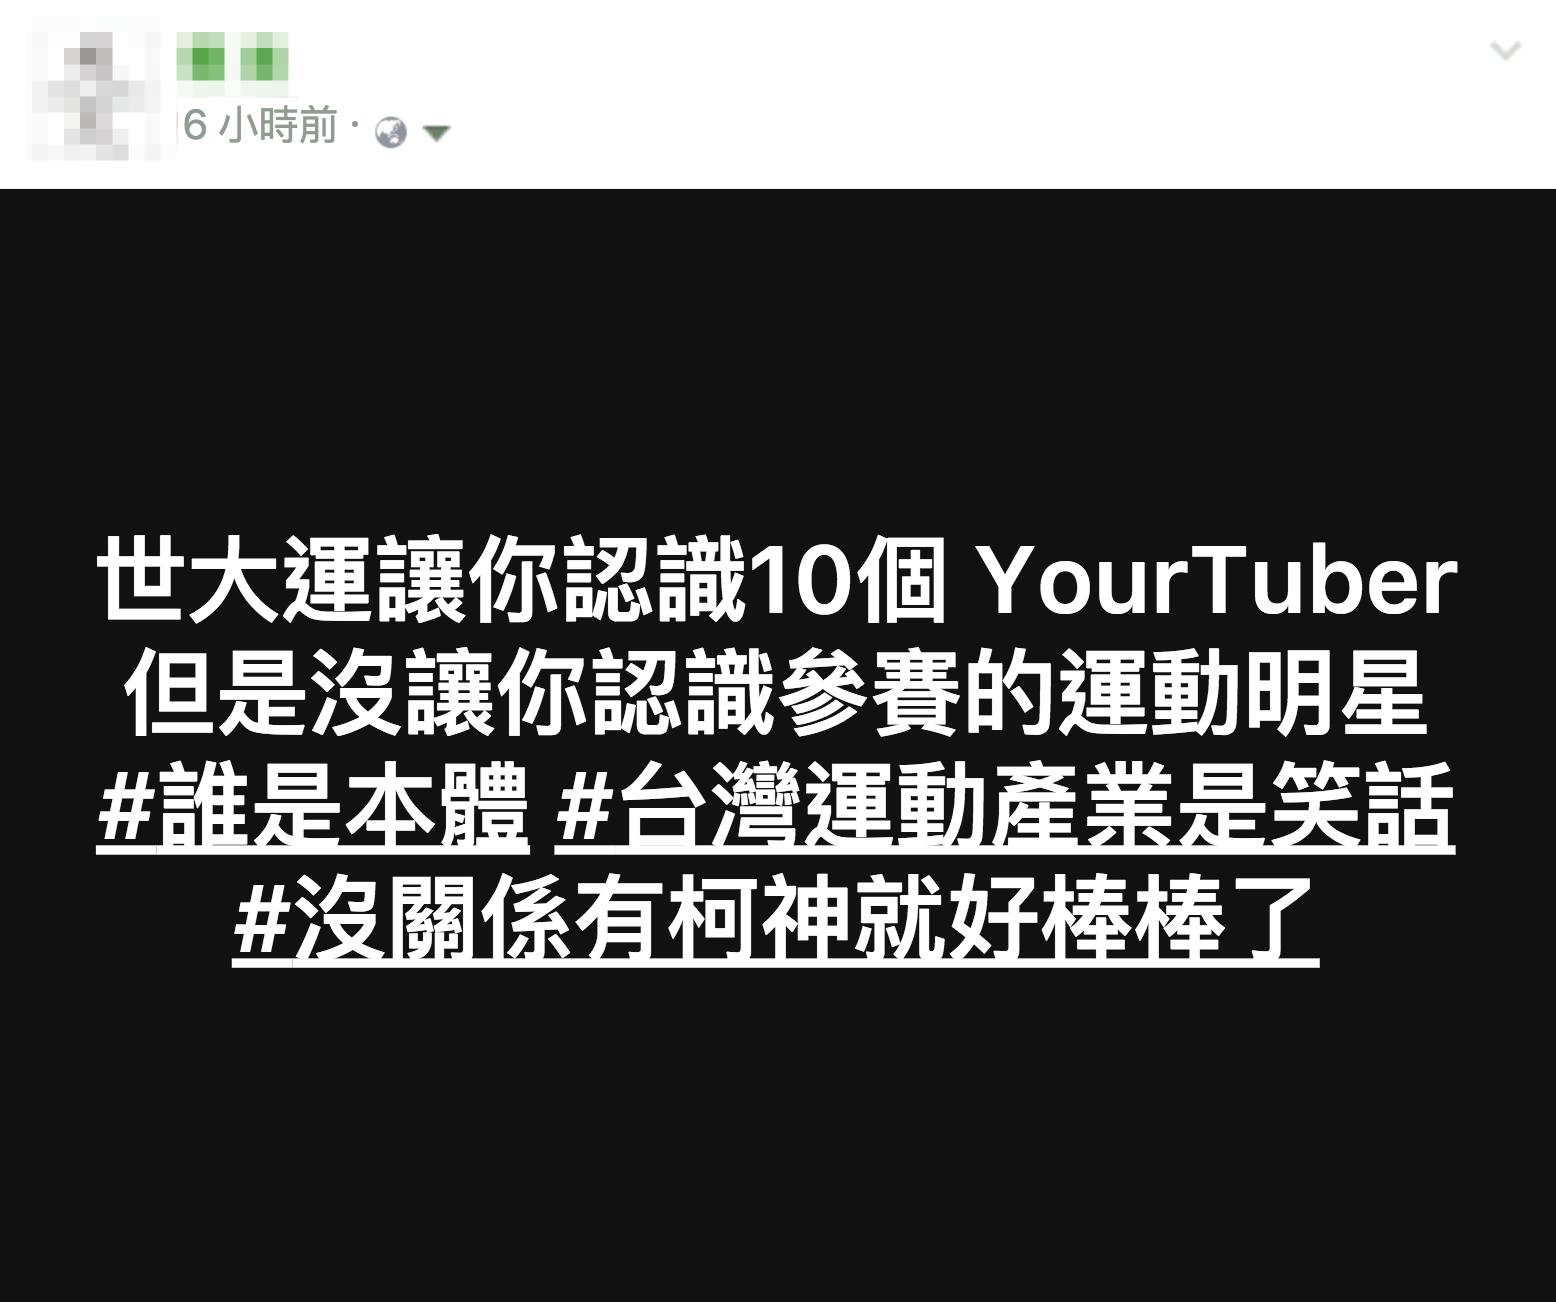 阿肯對於世大運 youtuber 行銷的感慨貼文截圖